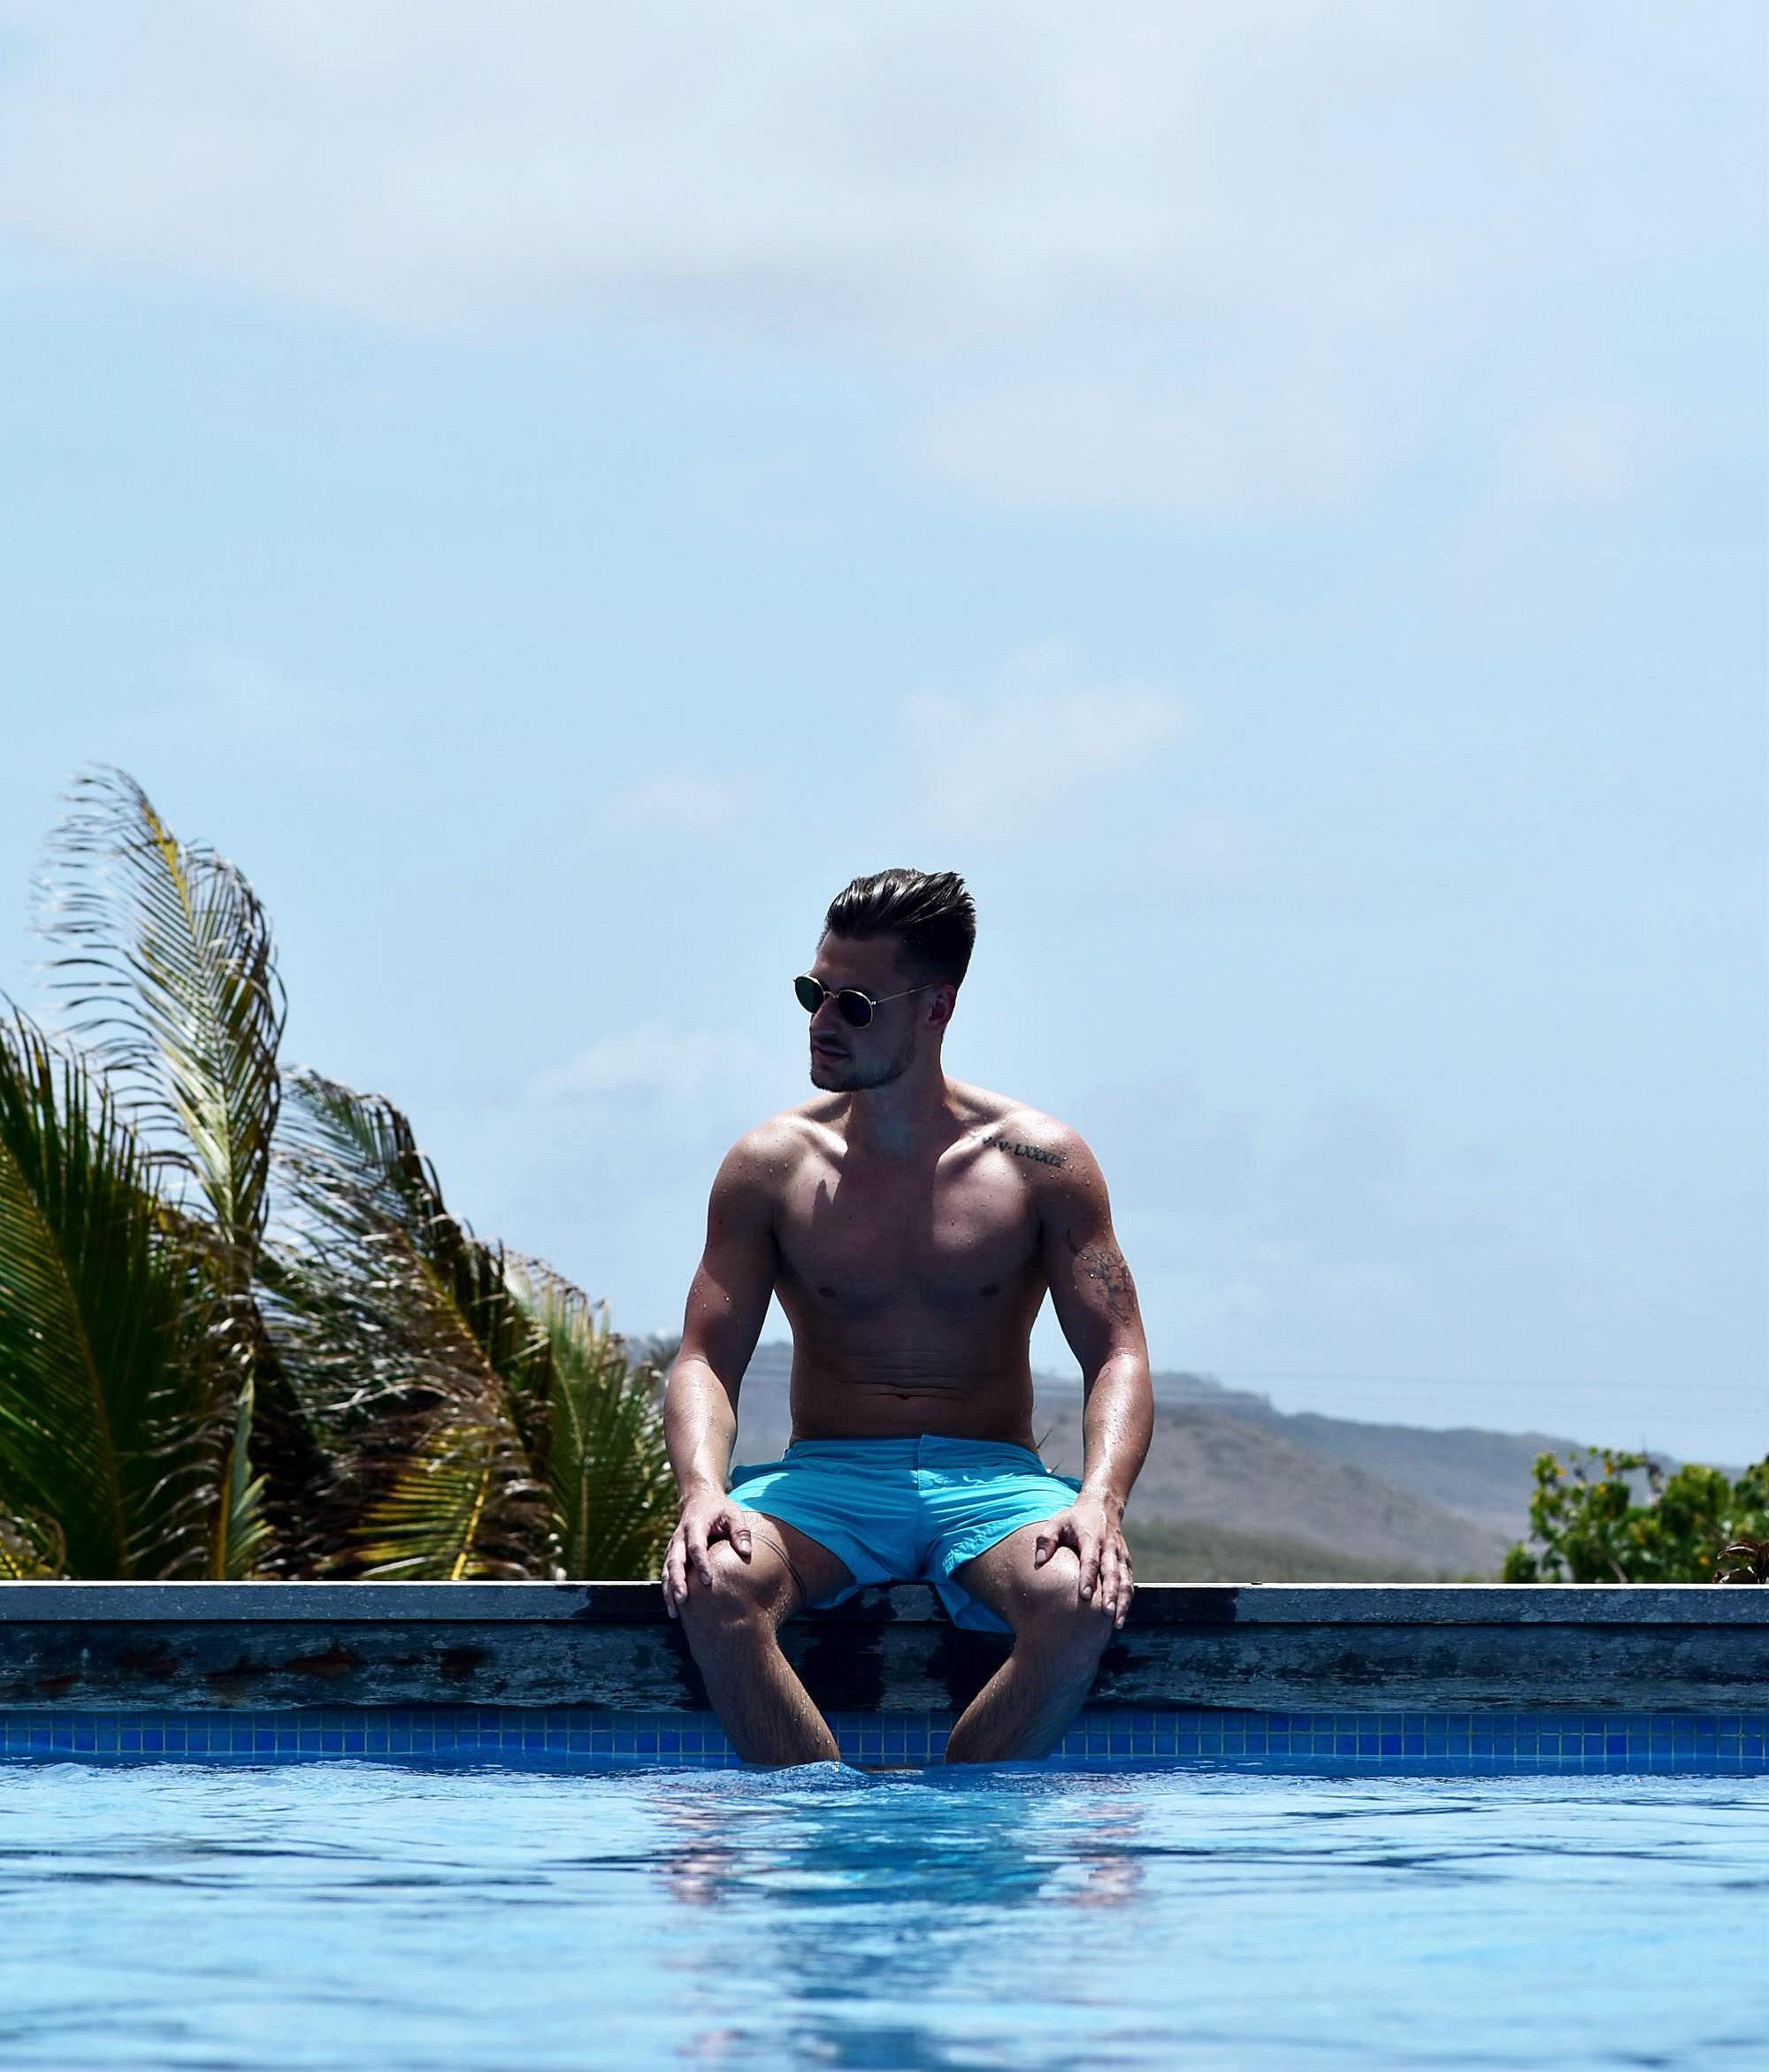 Tommeezjerry-Männerblog-Berlinblog-Fashionblog-Styleblog-Travelblog-Travel-Reiseblog-Reisen-Barbados-Karibik-Carribean-Summer-Sommer-Vacation-5